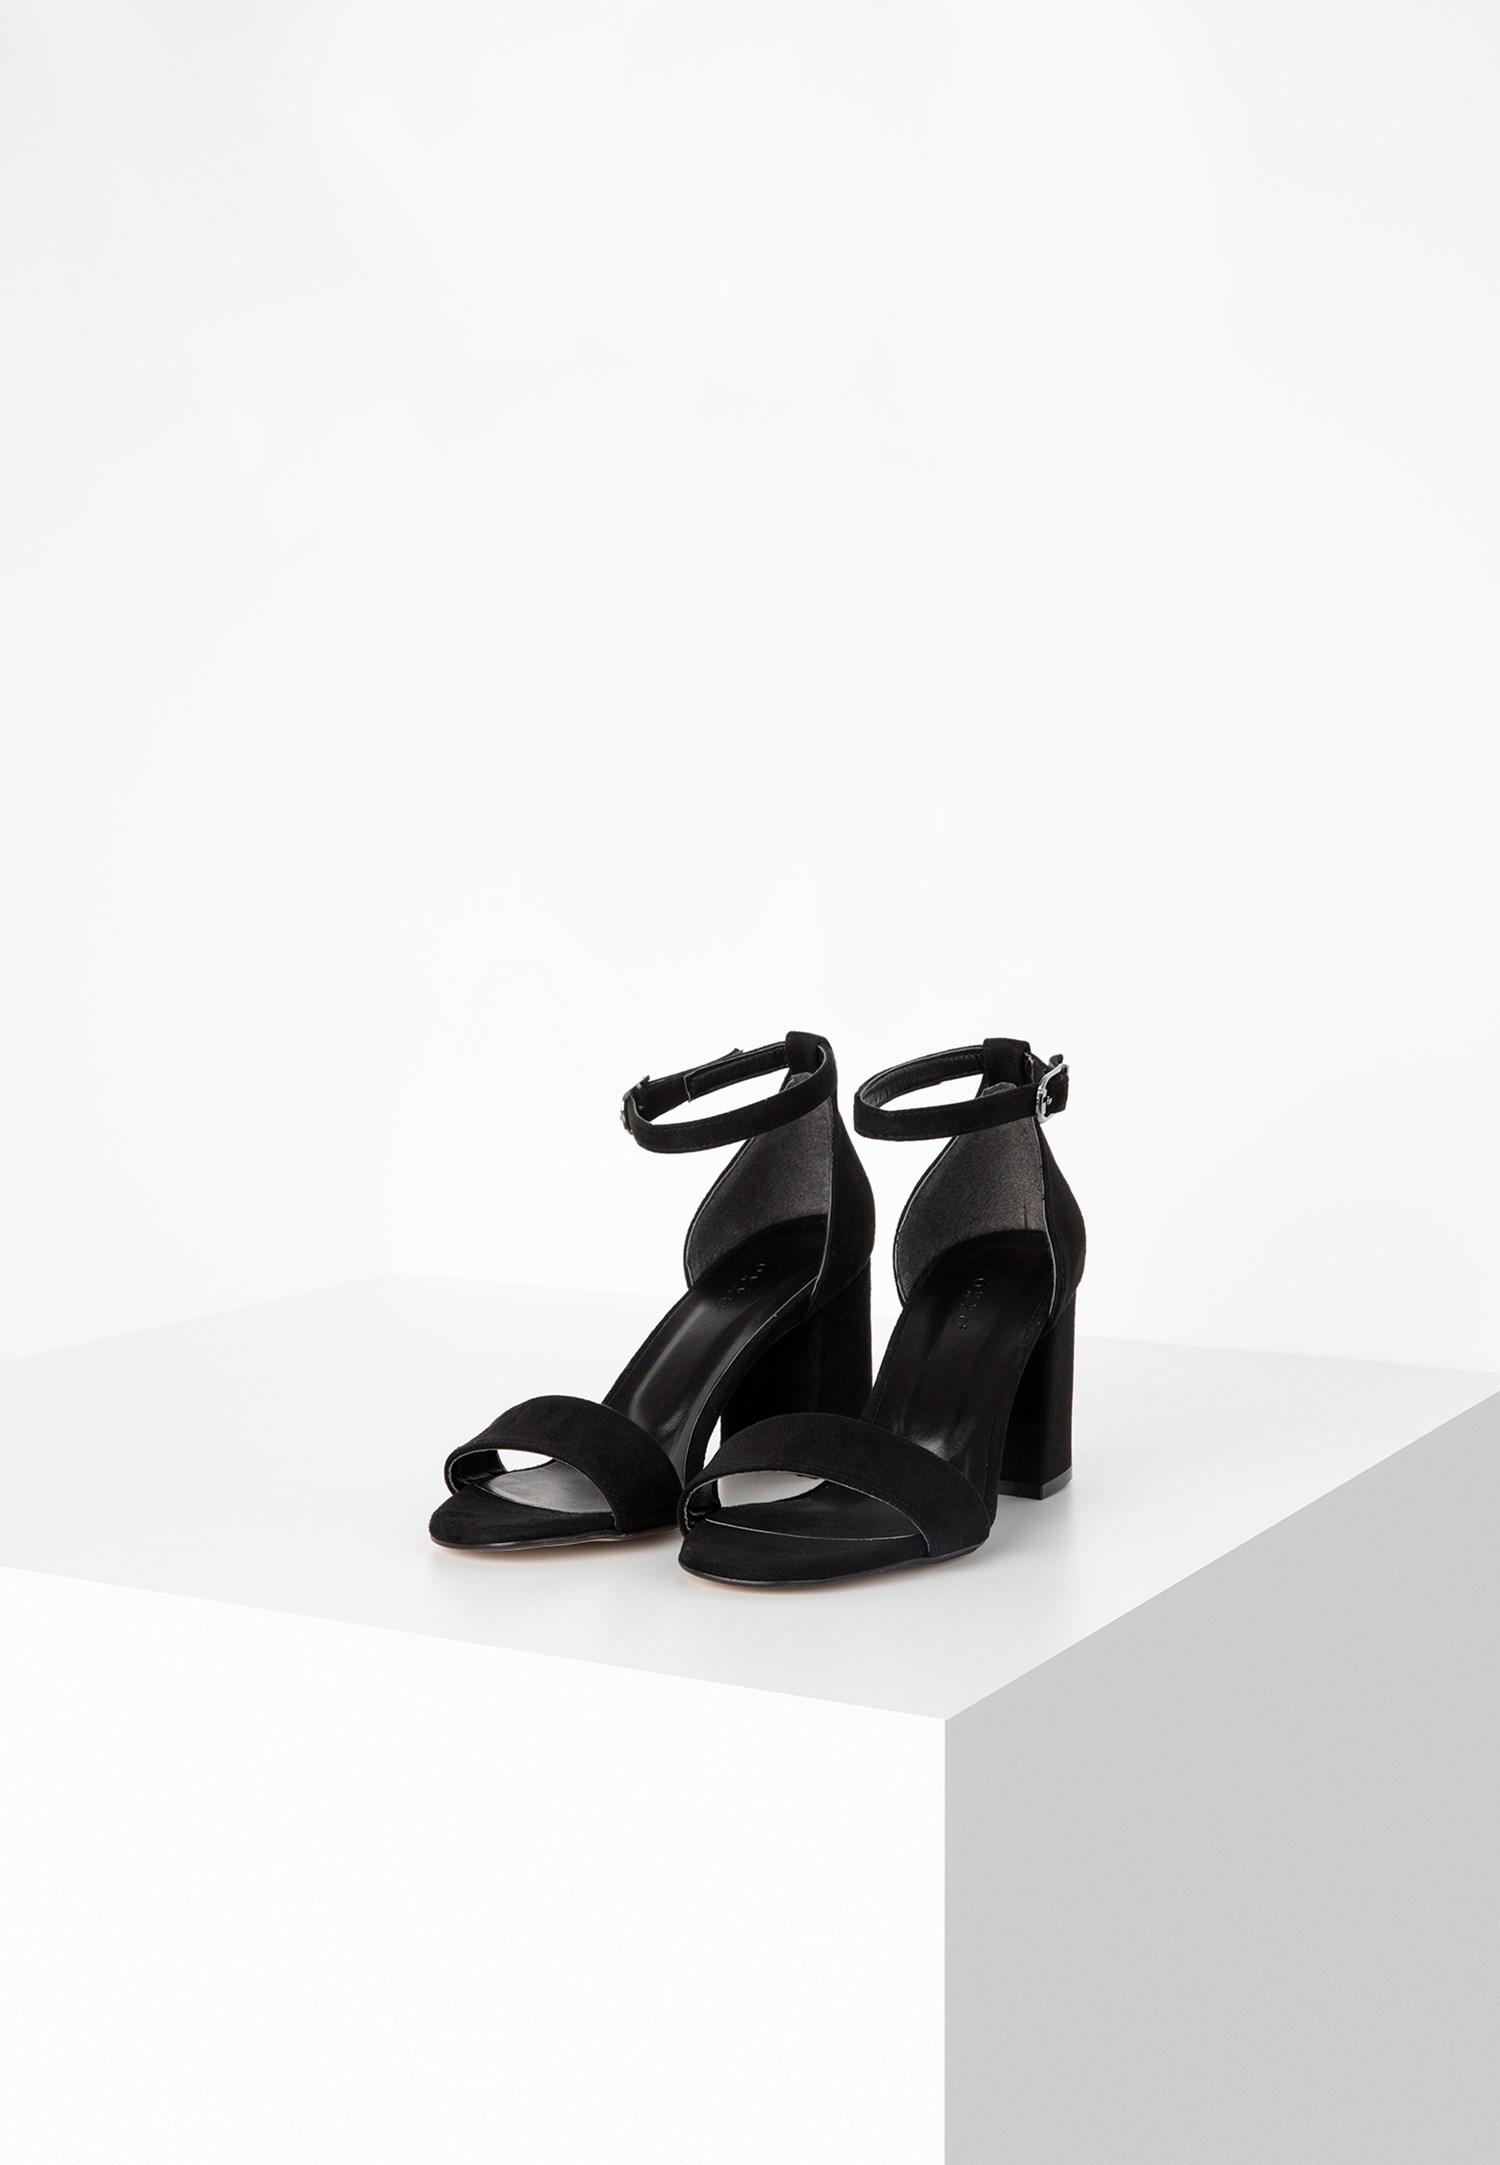 Bayan Siyah Tek Bantlı Topuklu Ayakkabı